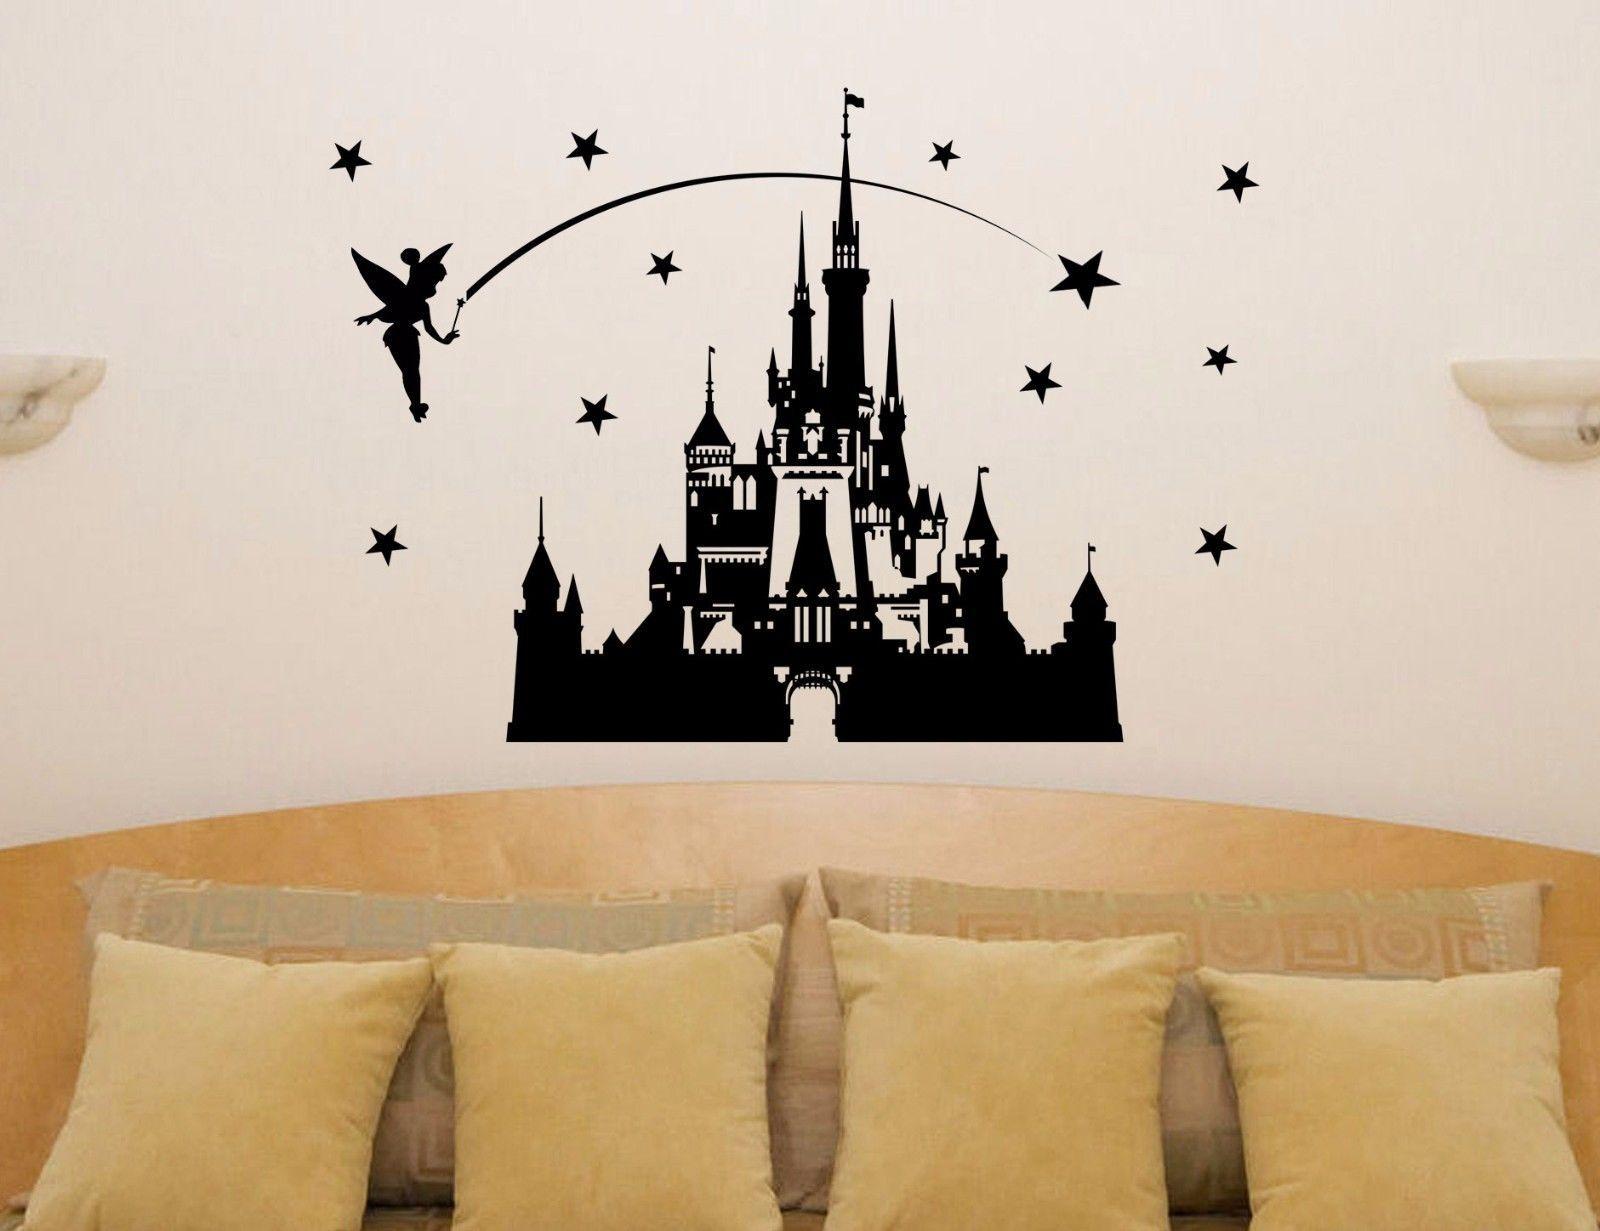 HWHD Os1638 2016 Kinderzimmer Karton Schloss Märchen Prinzessin Tinkerbell Wandkunst Aufkleber Aufkleber Kostenloser Versand